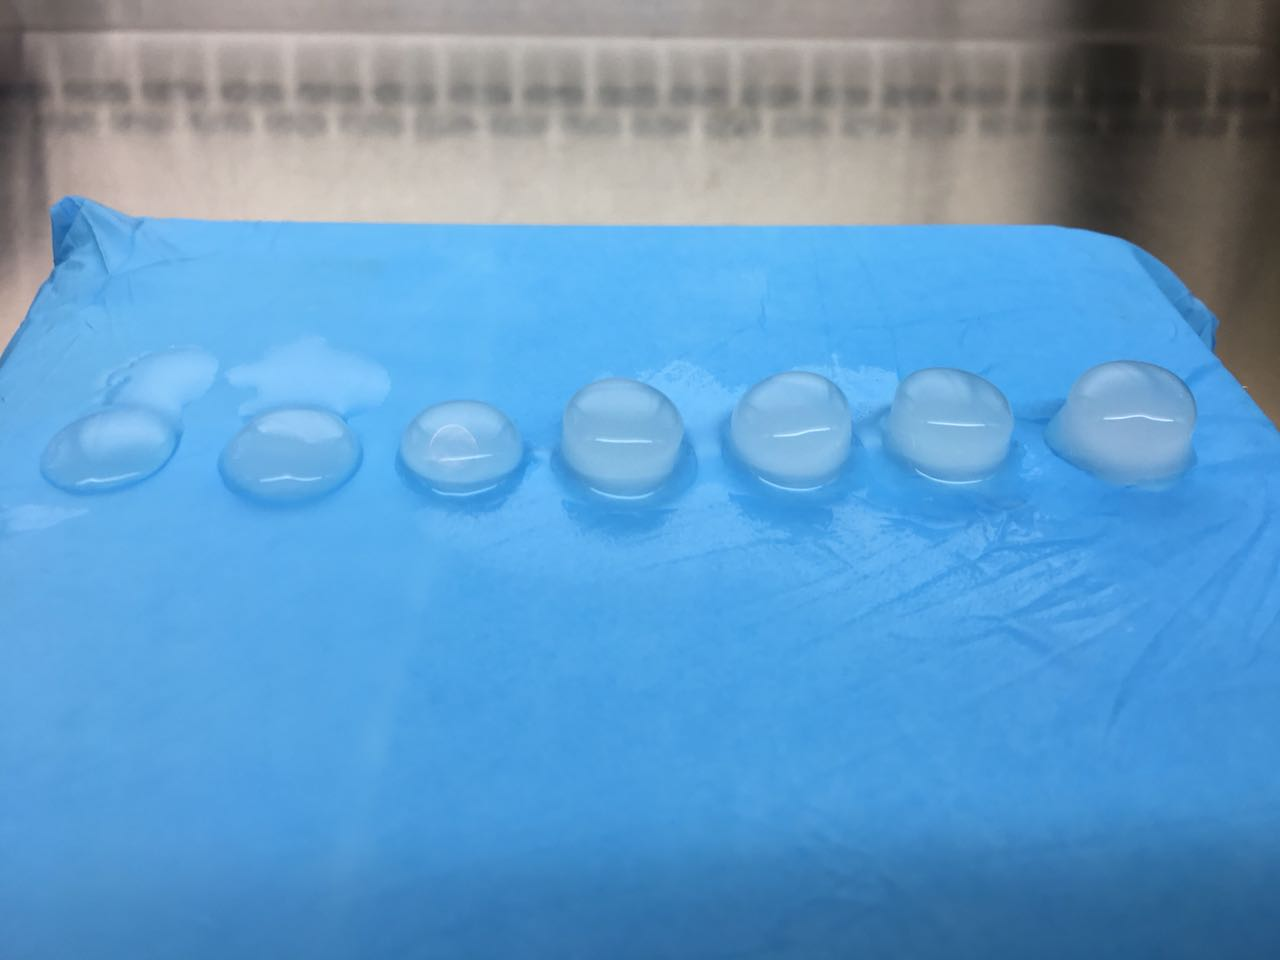 Parches de celulosa. FOTO Gentileza investigadores